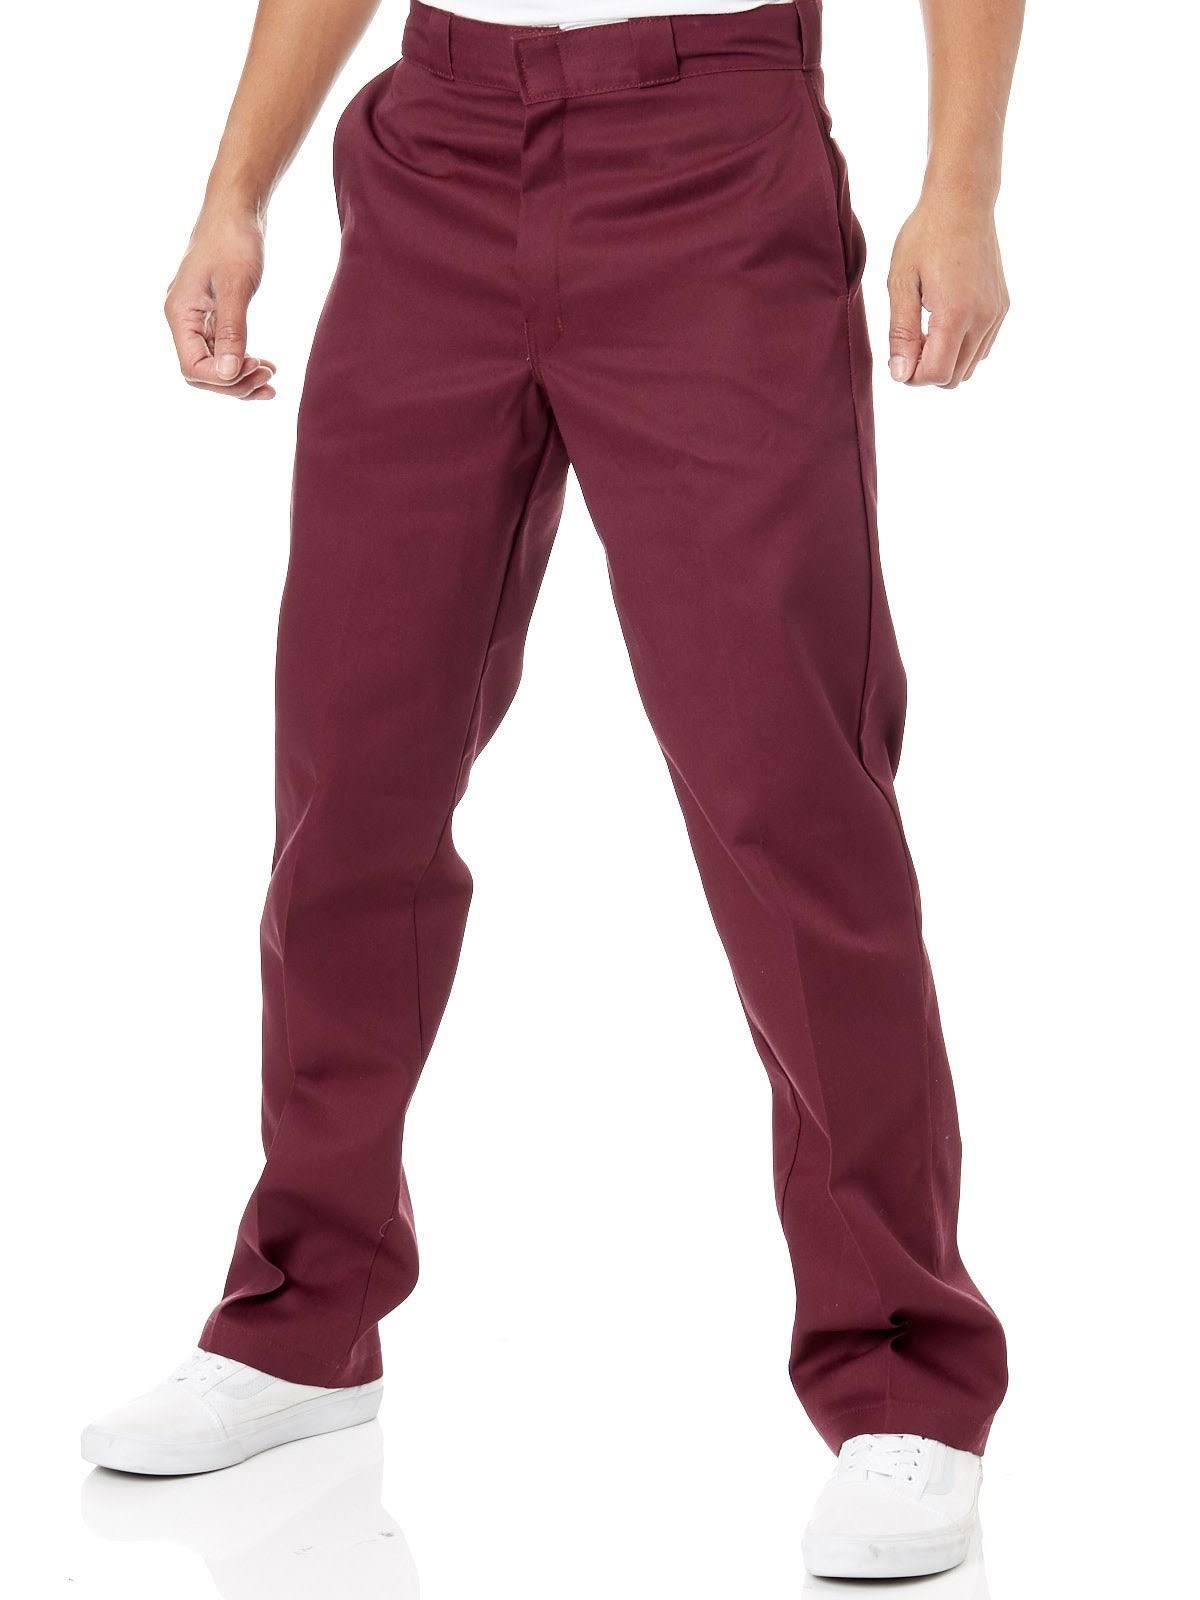 originale Pantalone da 874 Dickies Maroon lavoro Röd TKlJcF13